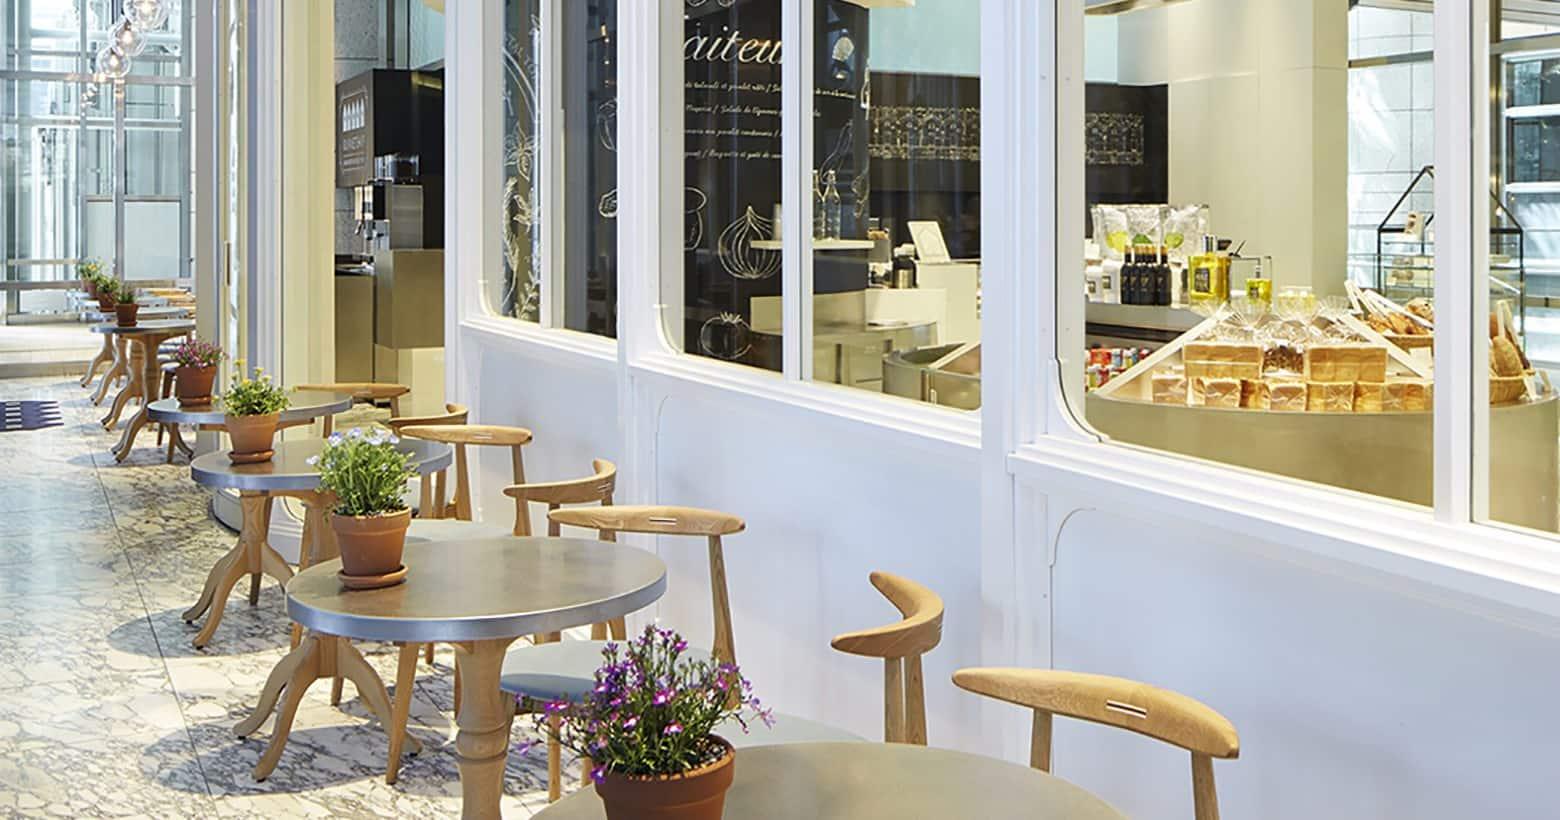 The Mandarin Oriental Gourmet Shop